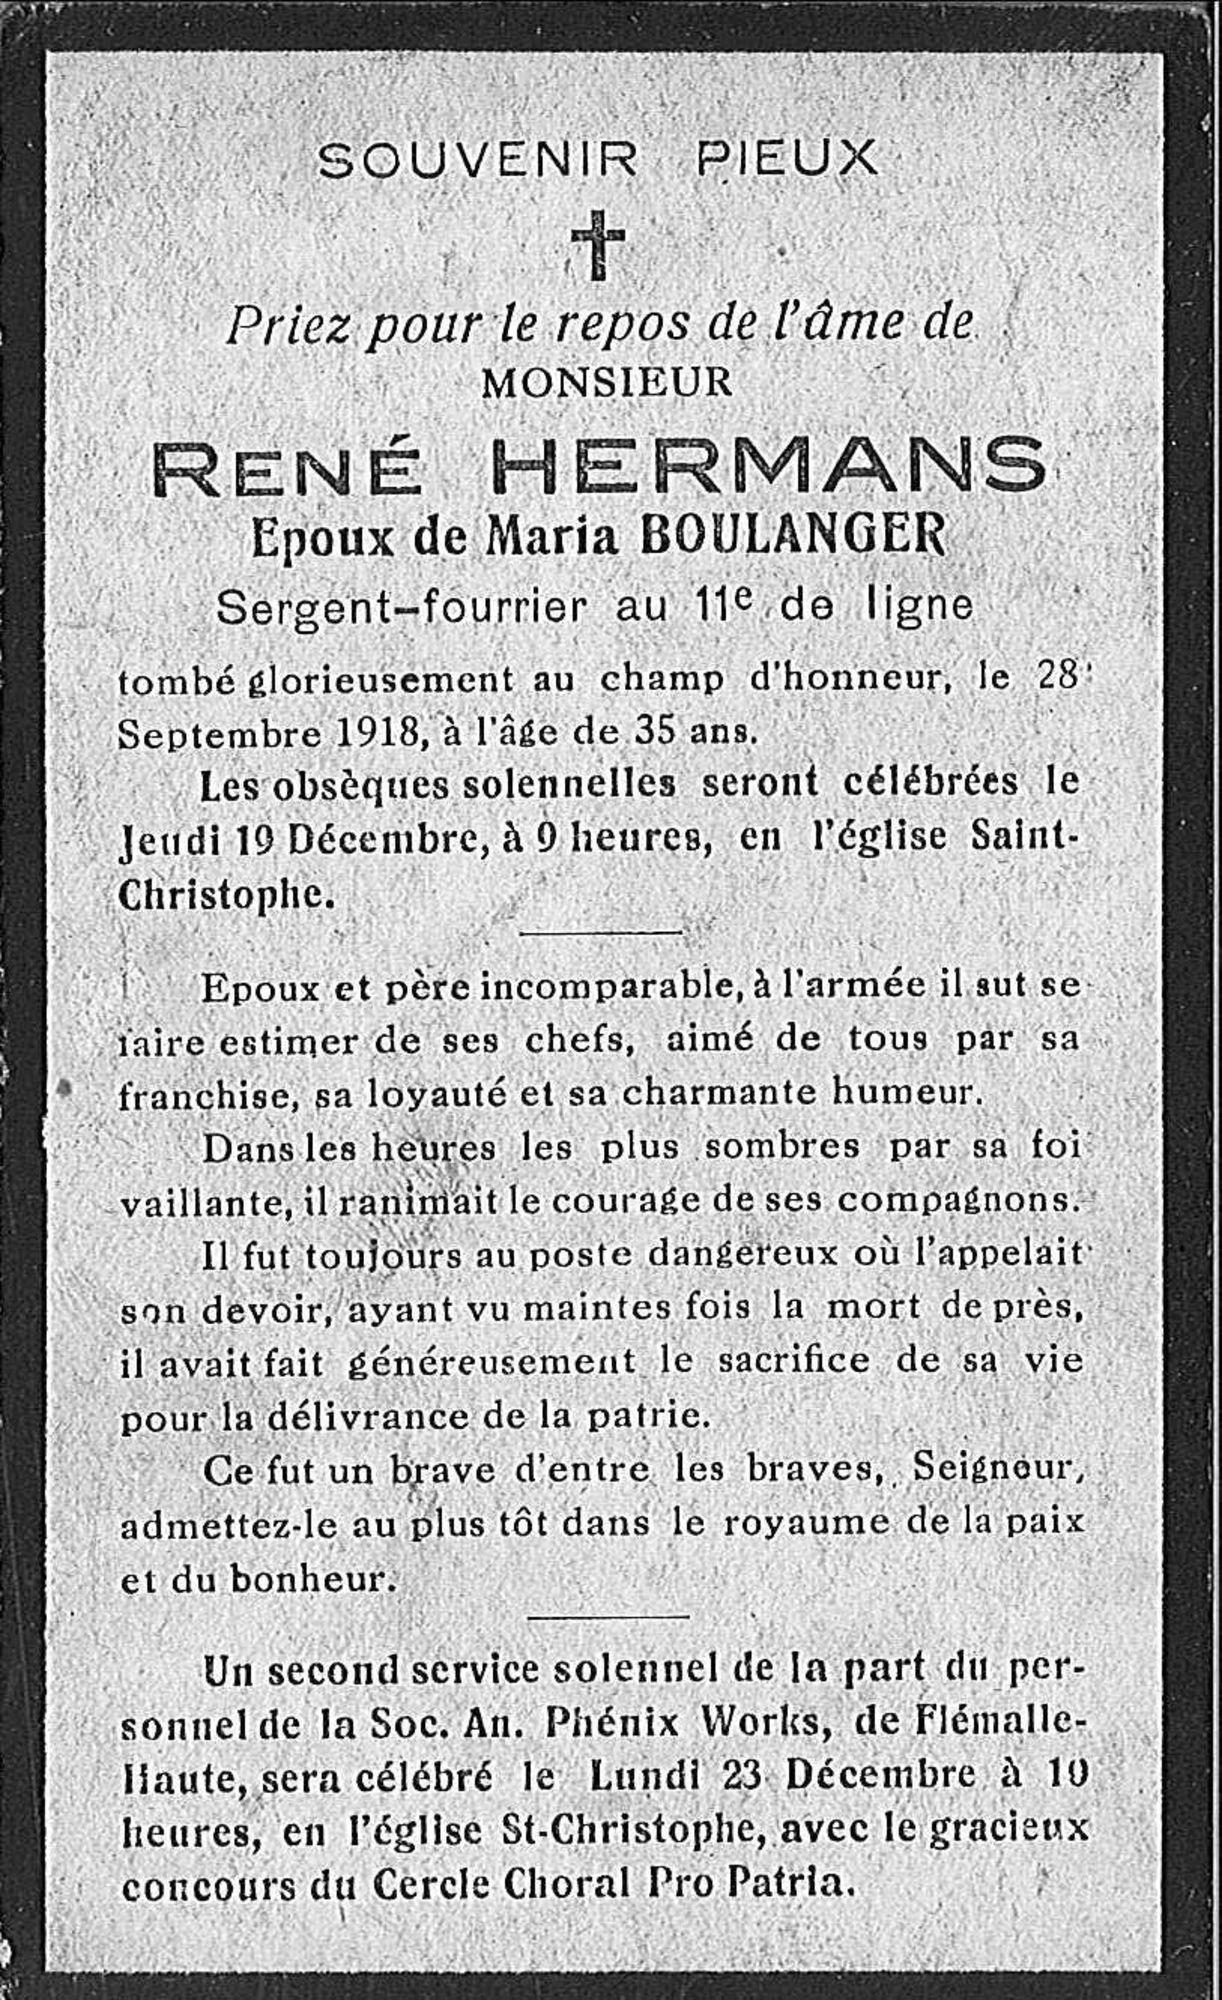 René Hermans